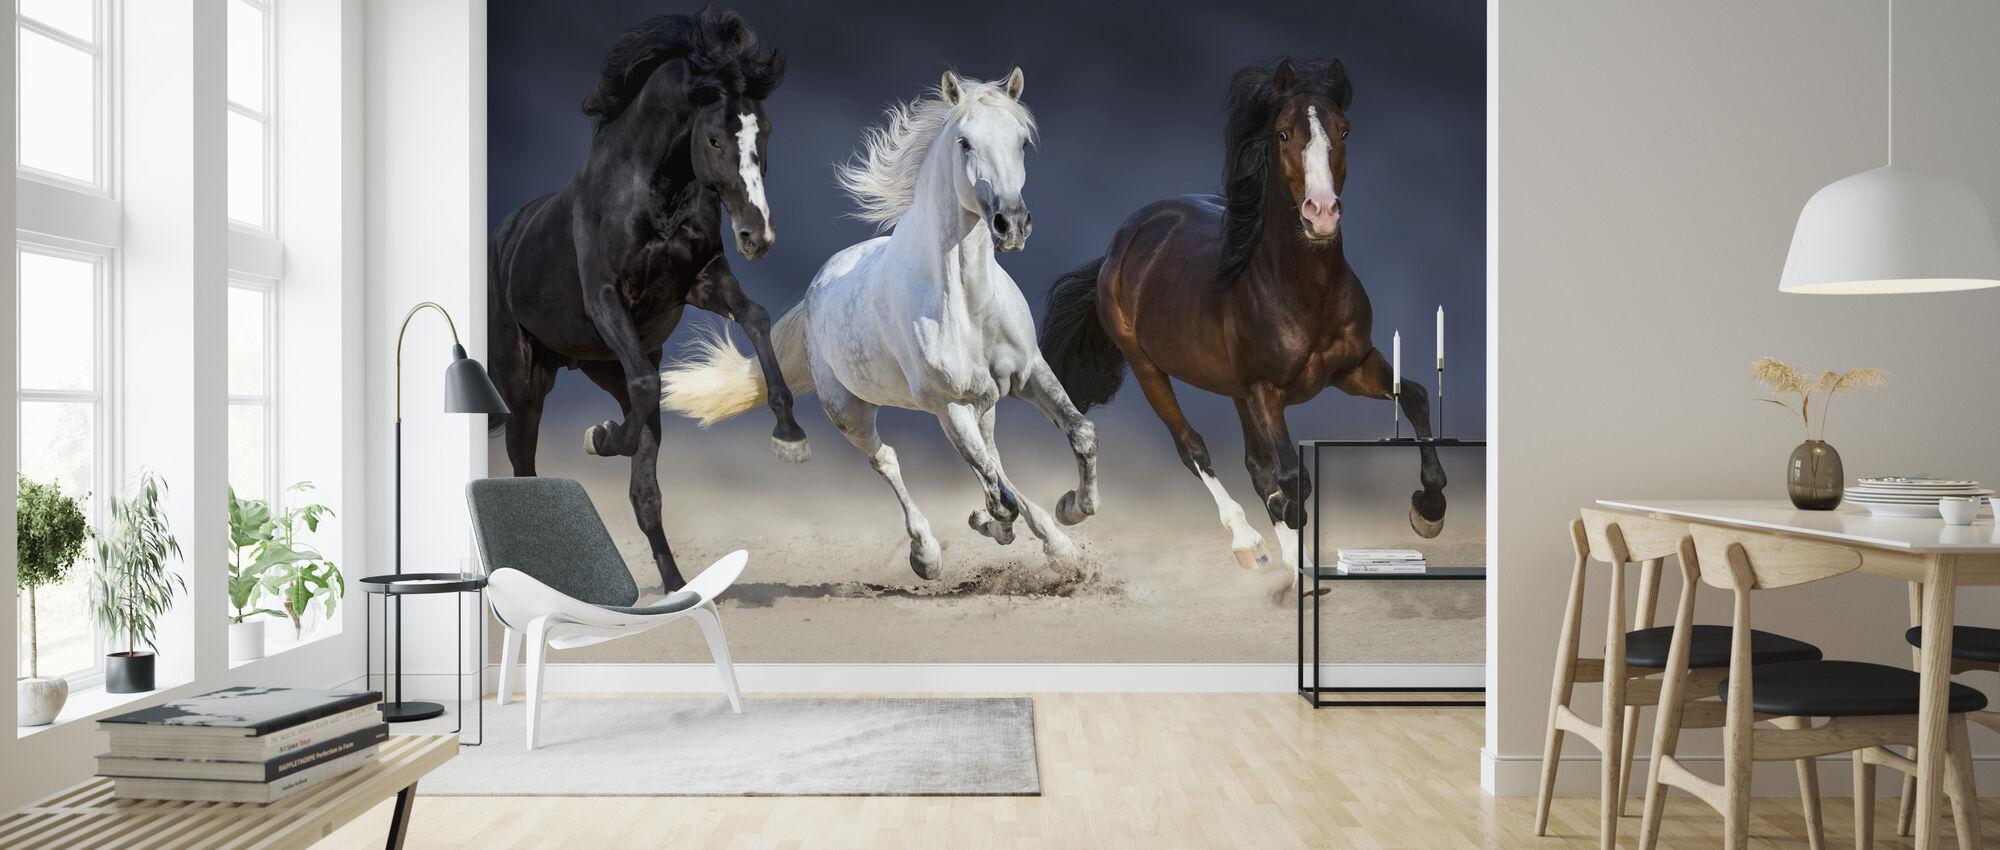 Kolme hevosta ajaa - Tapetti - Olohuone